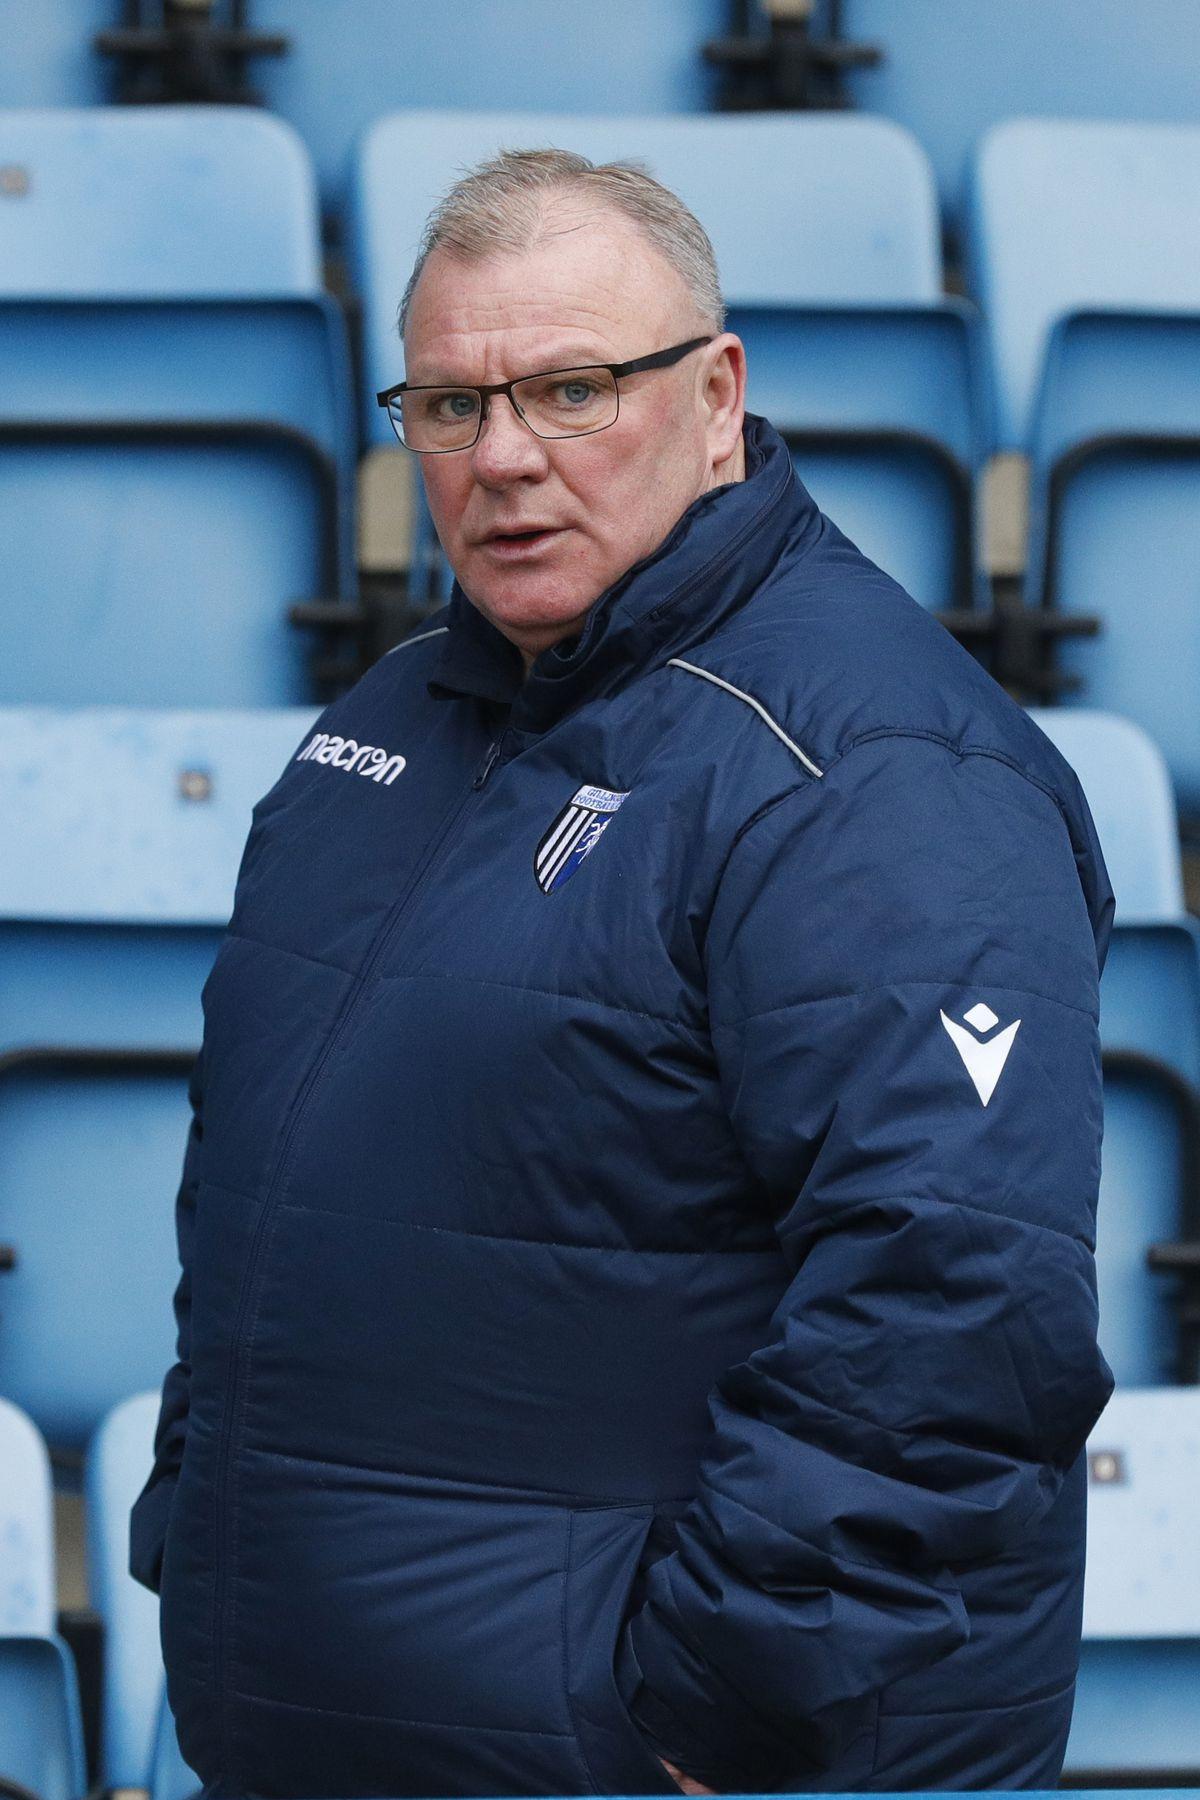 Gillingham boss Steve Evans during the goalless draw between his side and Shrewsbury last season (AMA)